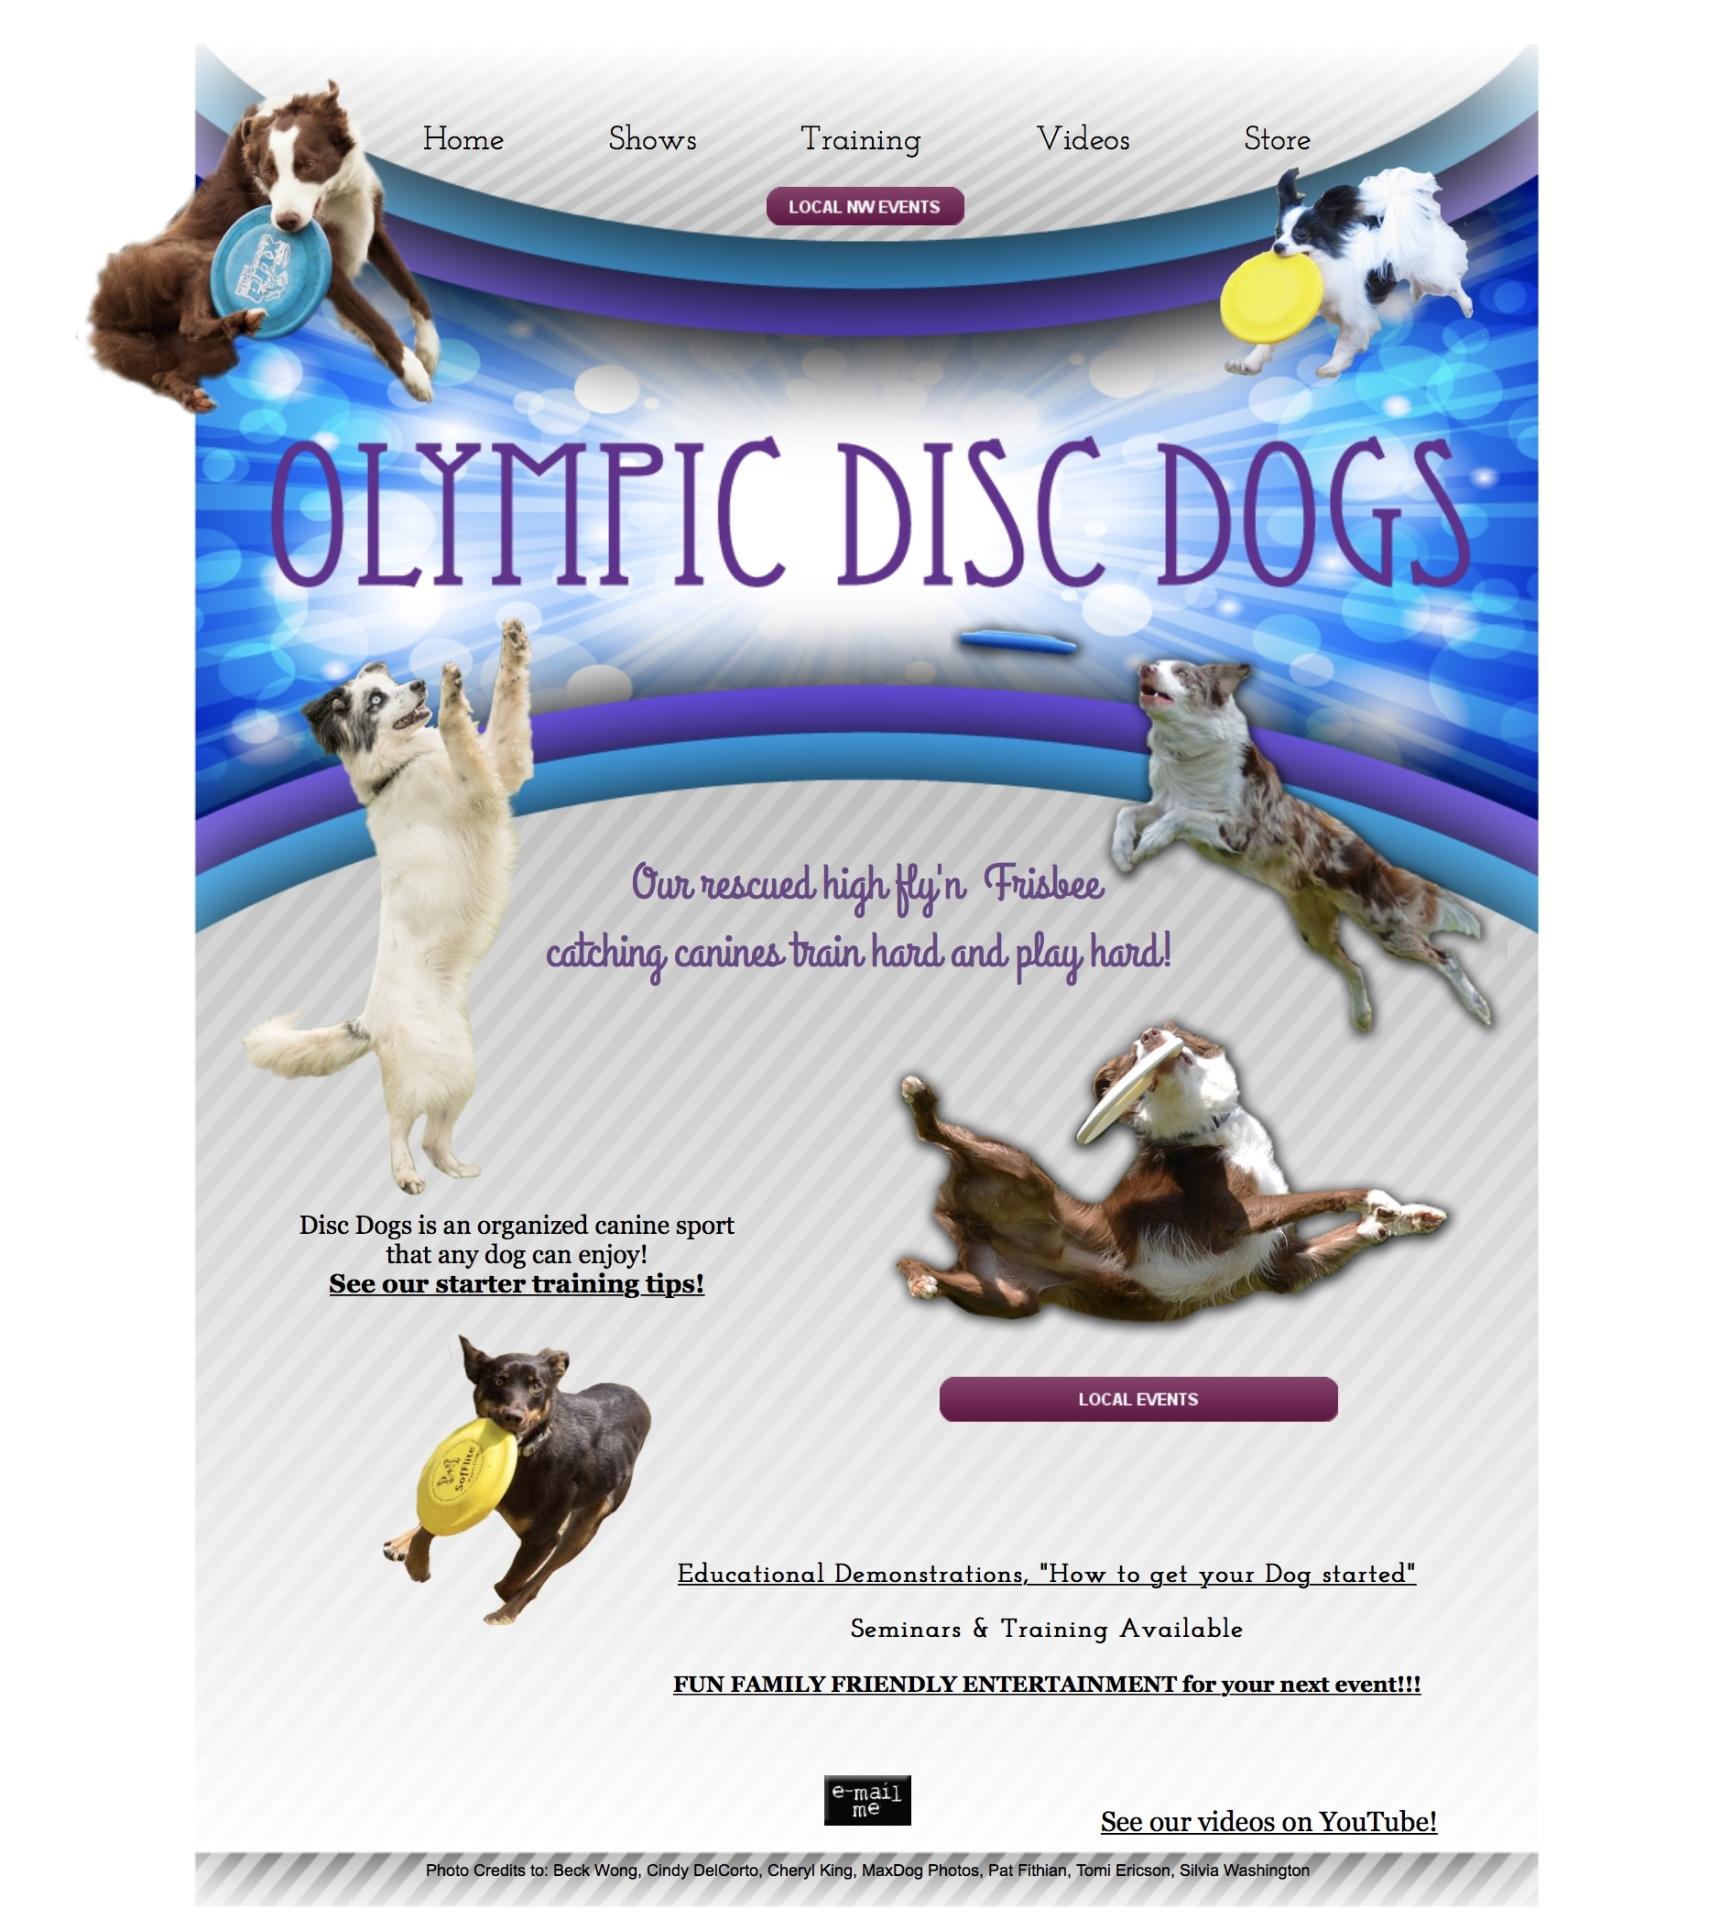 DiscDoggin.com